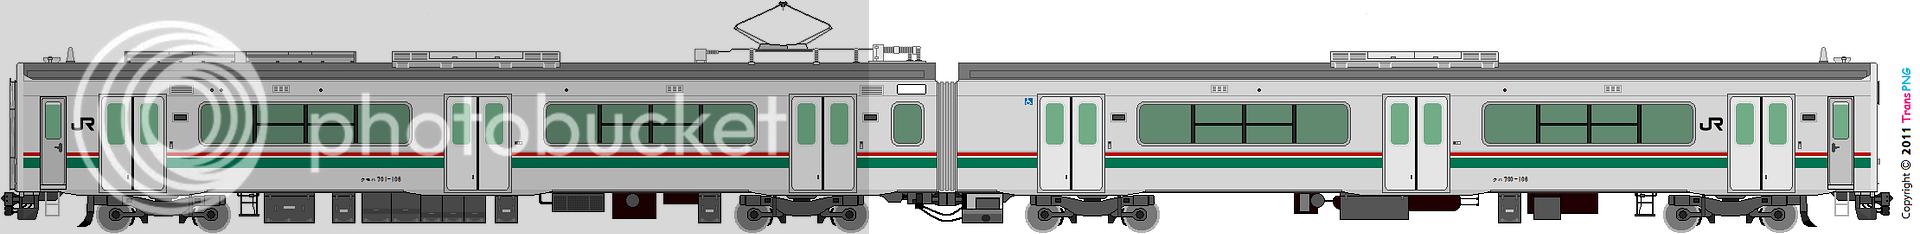 Train 2265